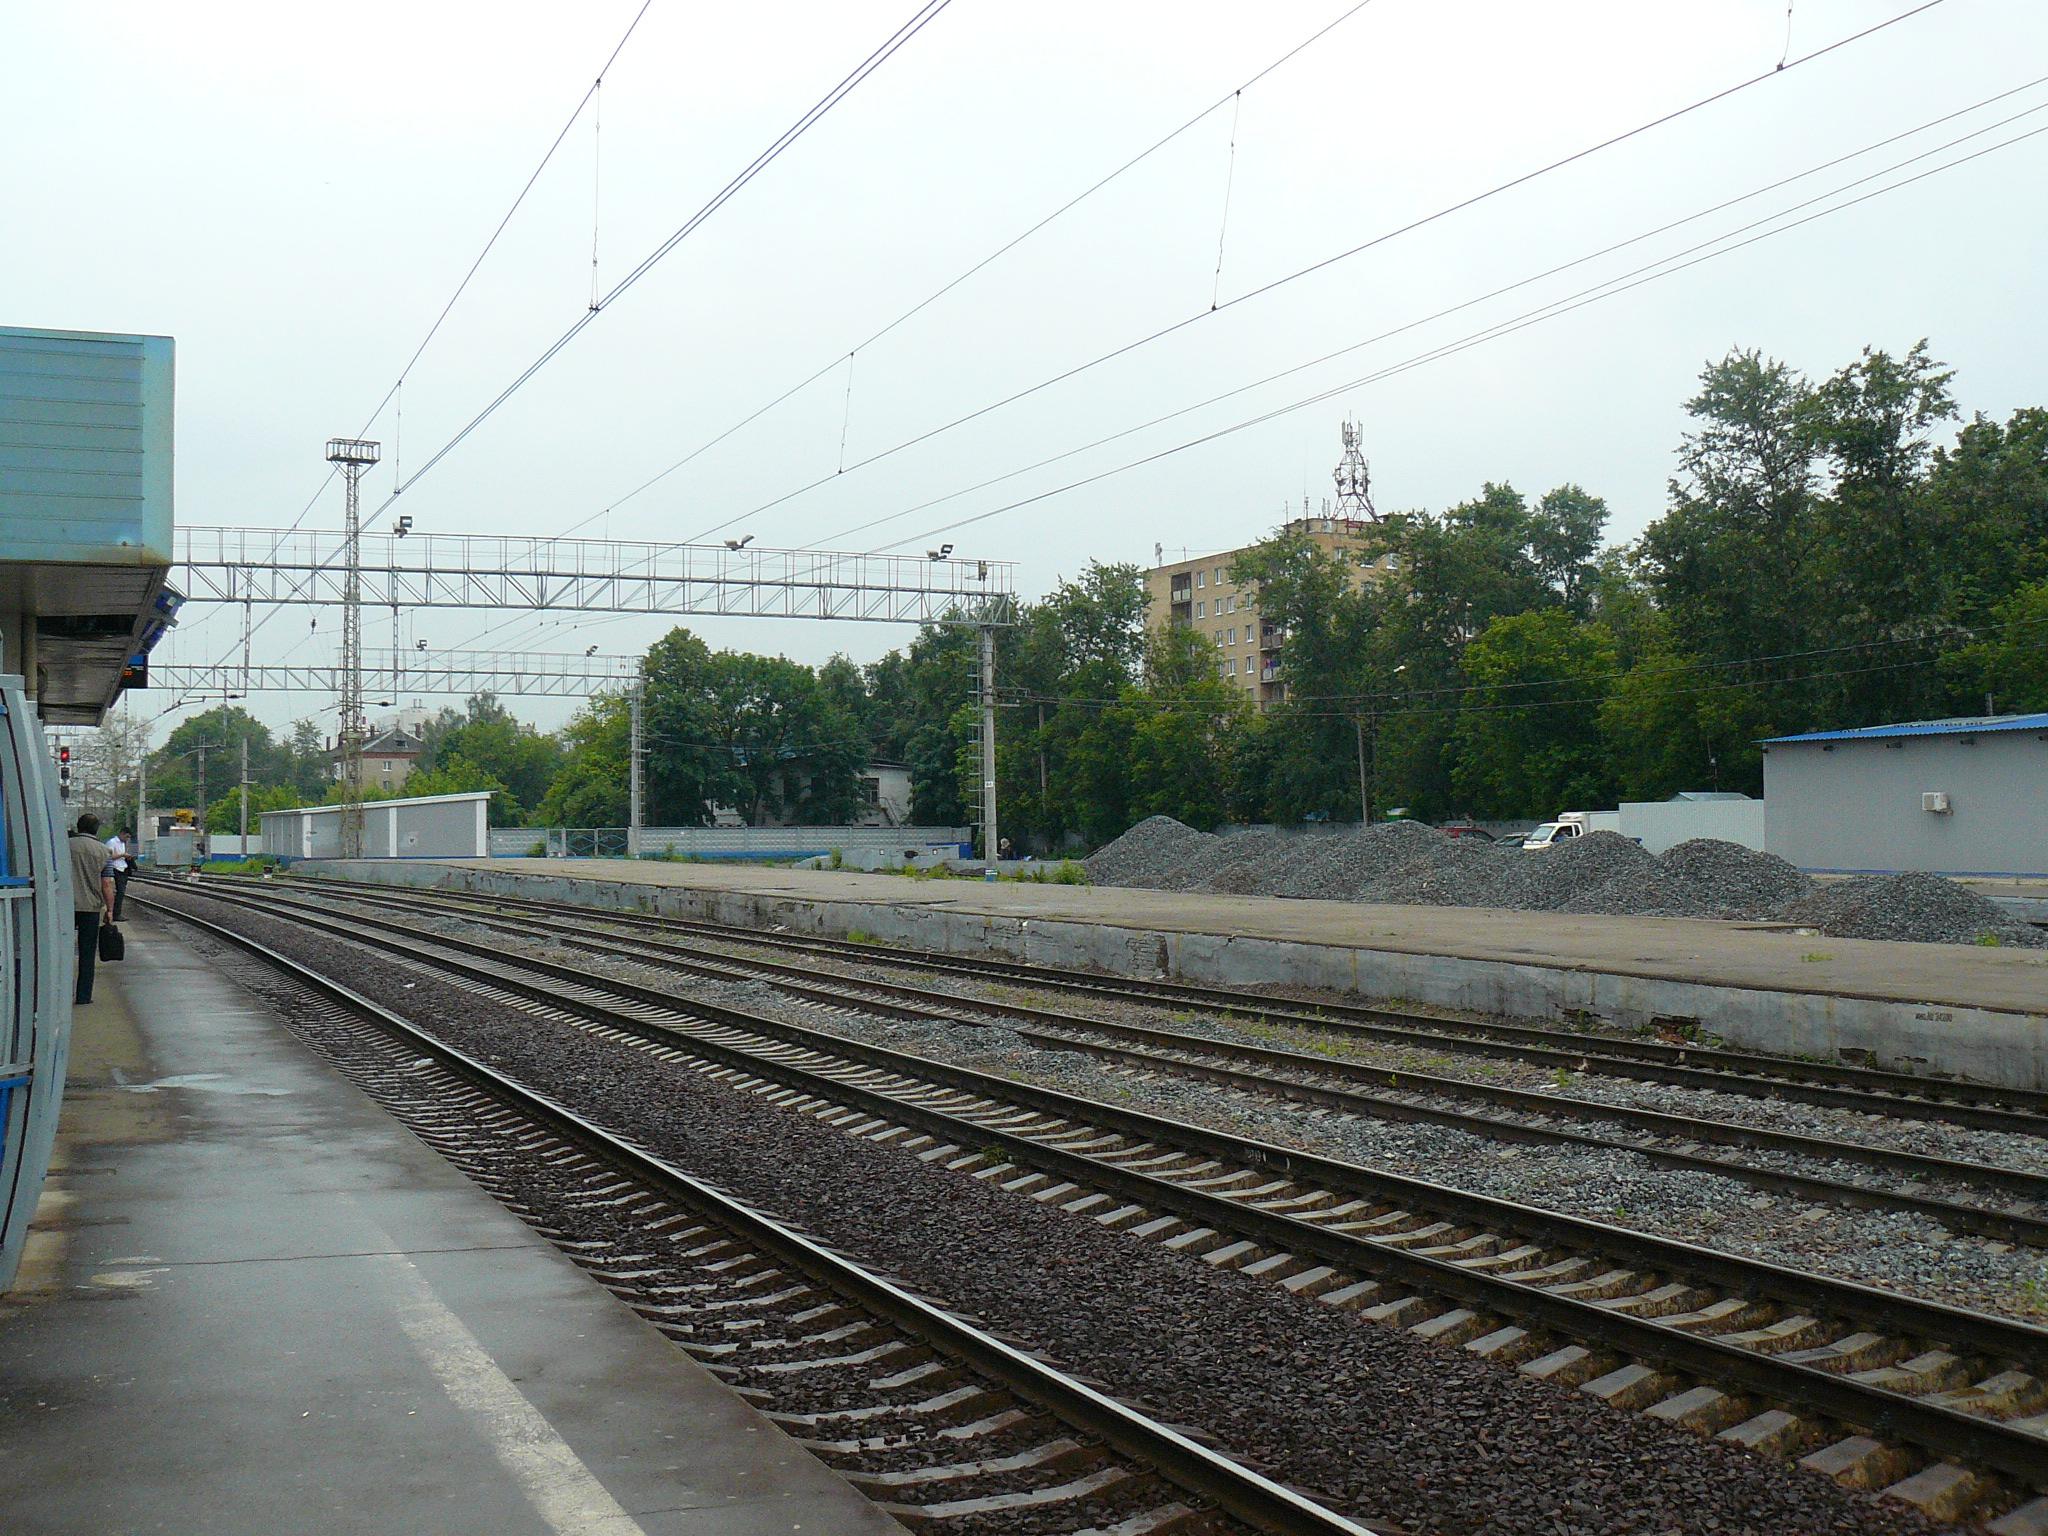 http://pics.livejournal.com/pushkino_2009/pic/000yqqrx